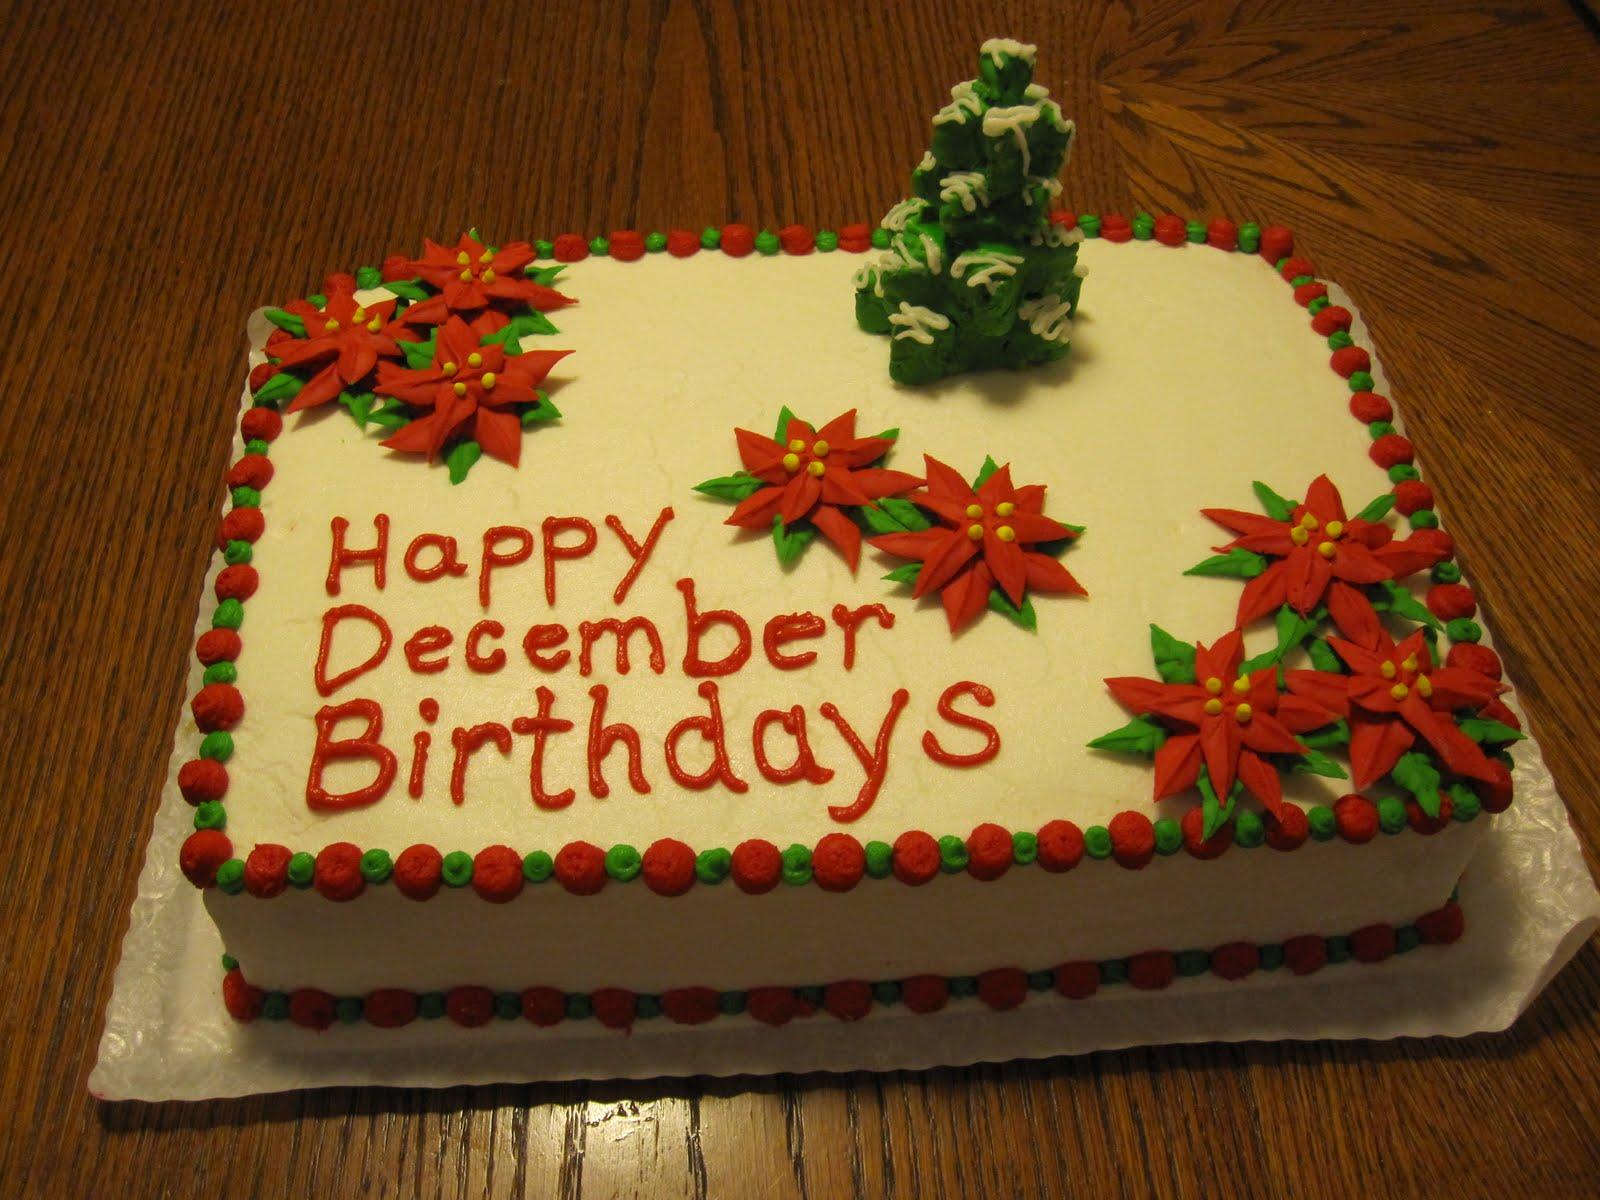 Taste & See Cake Design: Happy December Birthdays